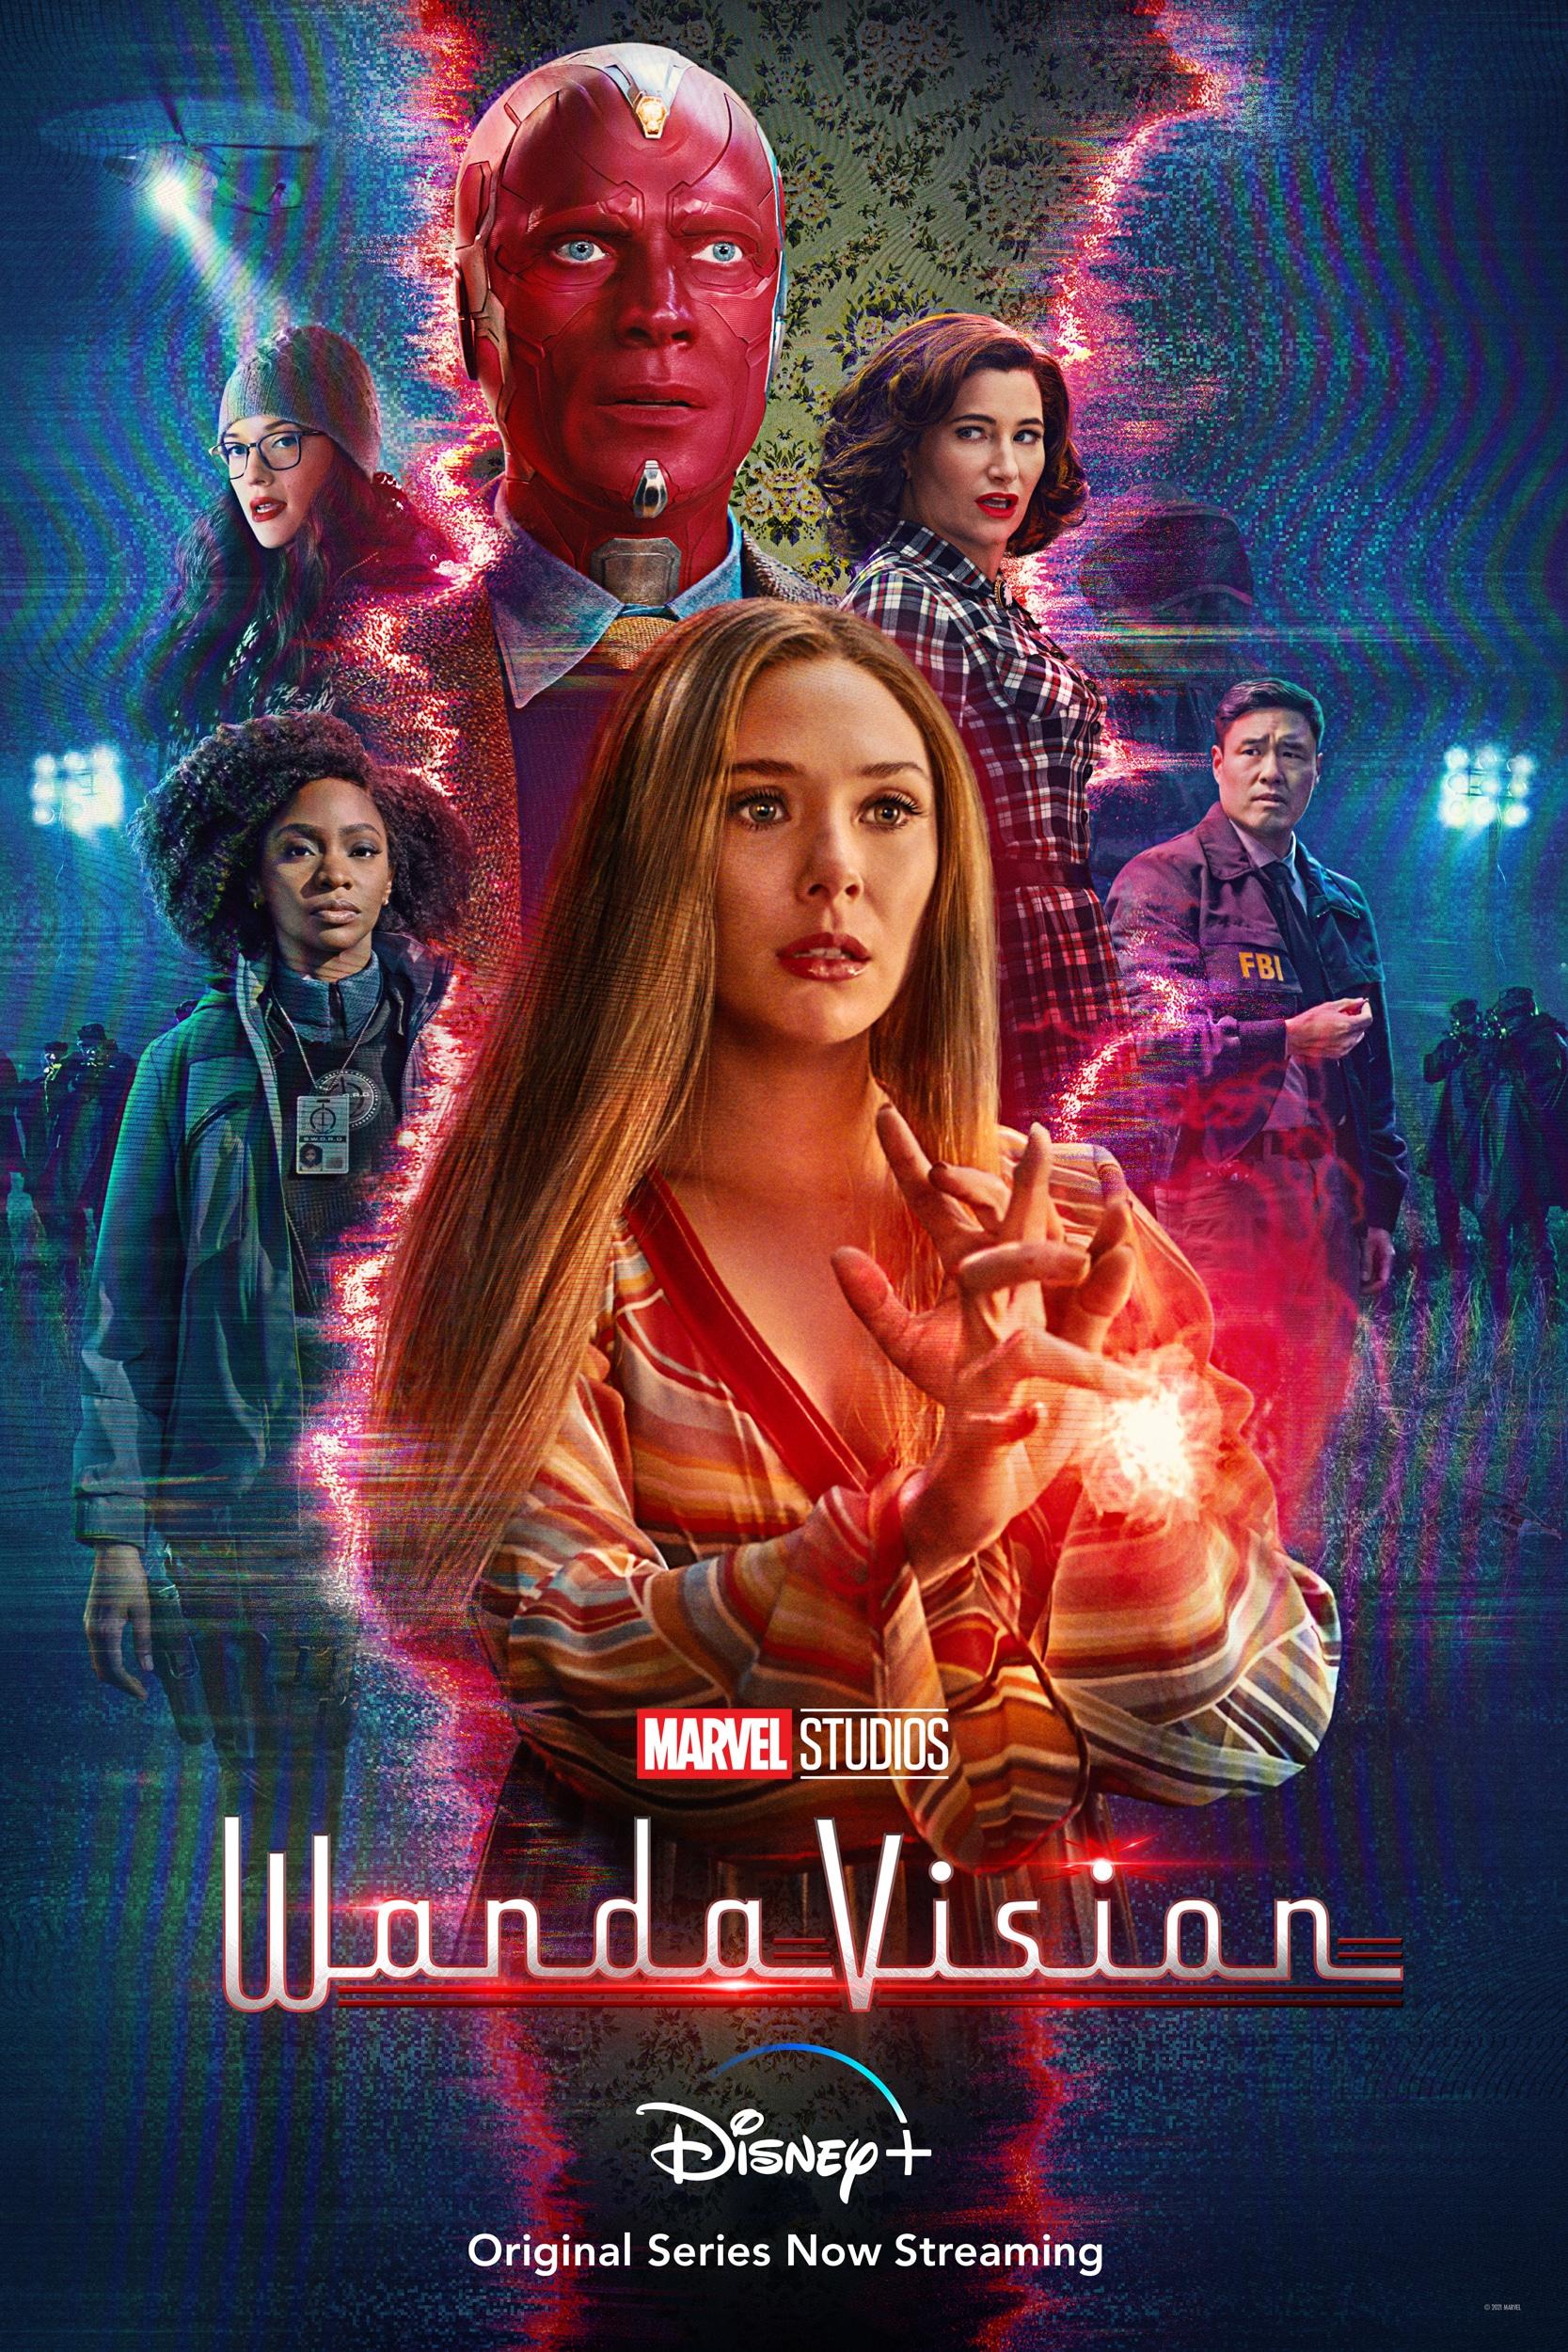 WandaVision Character Posters